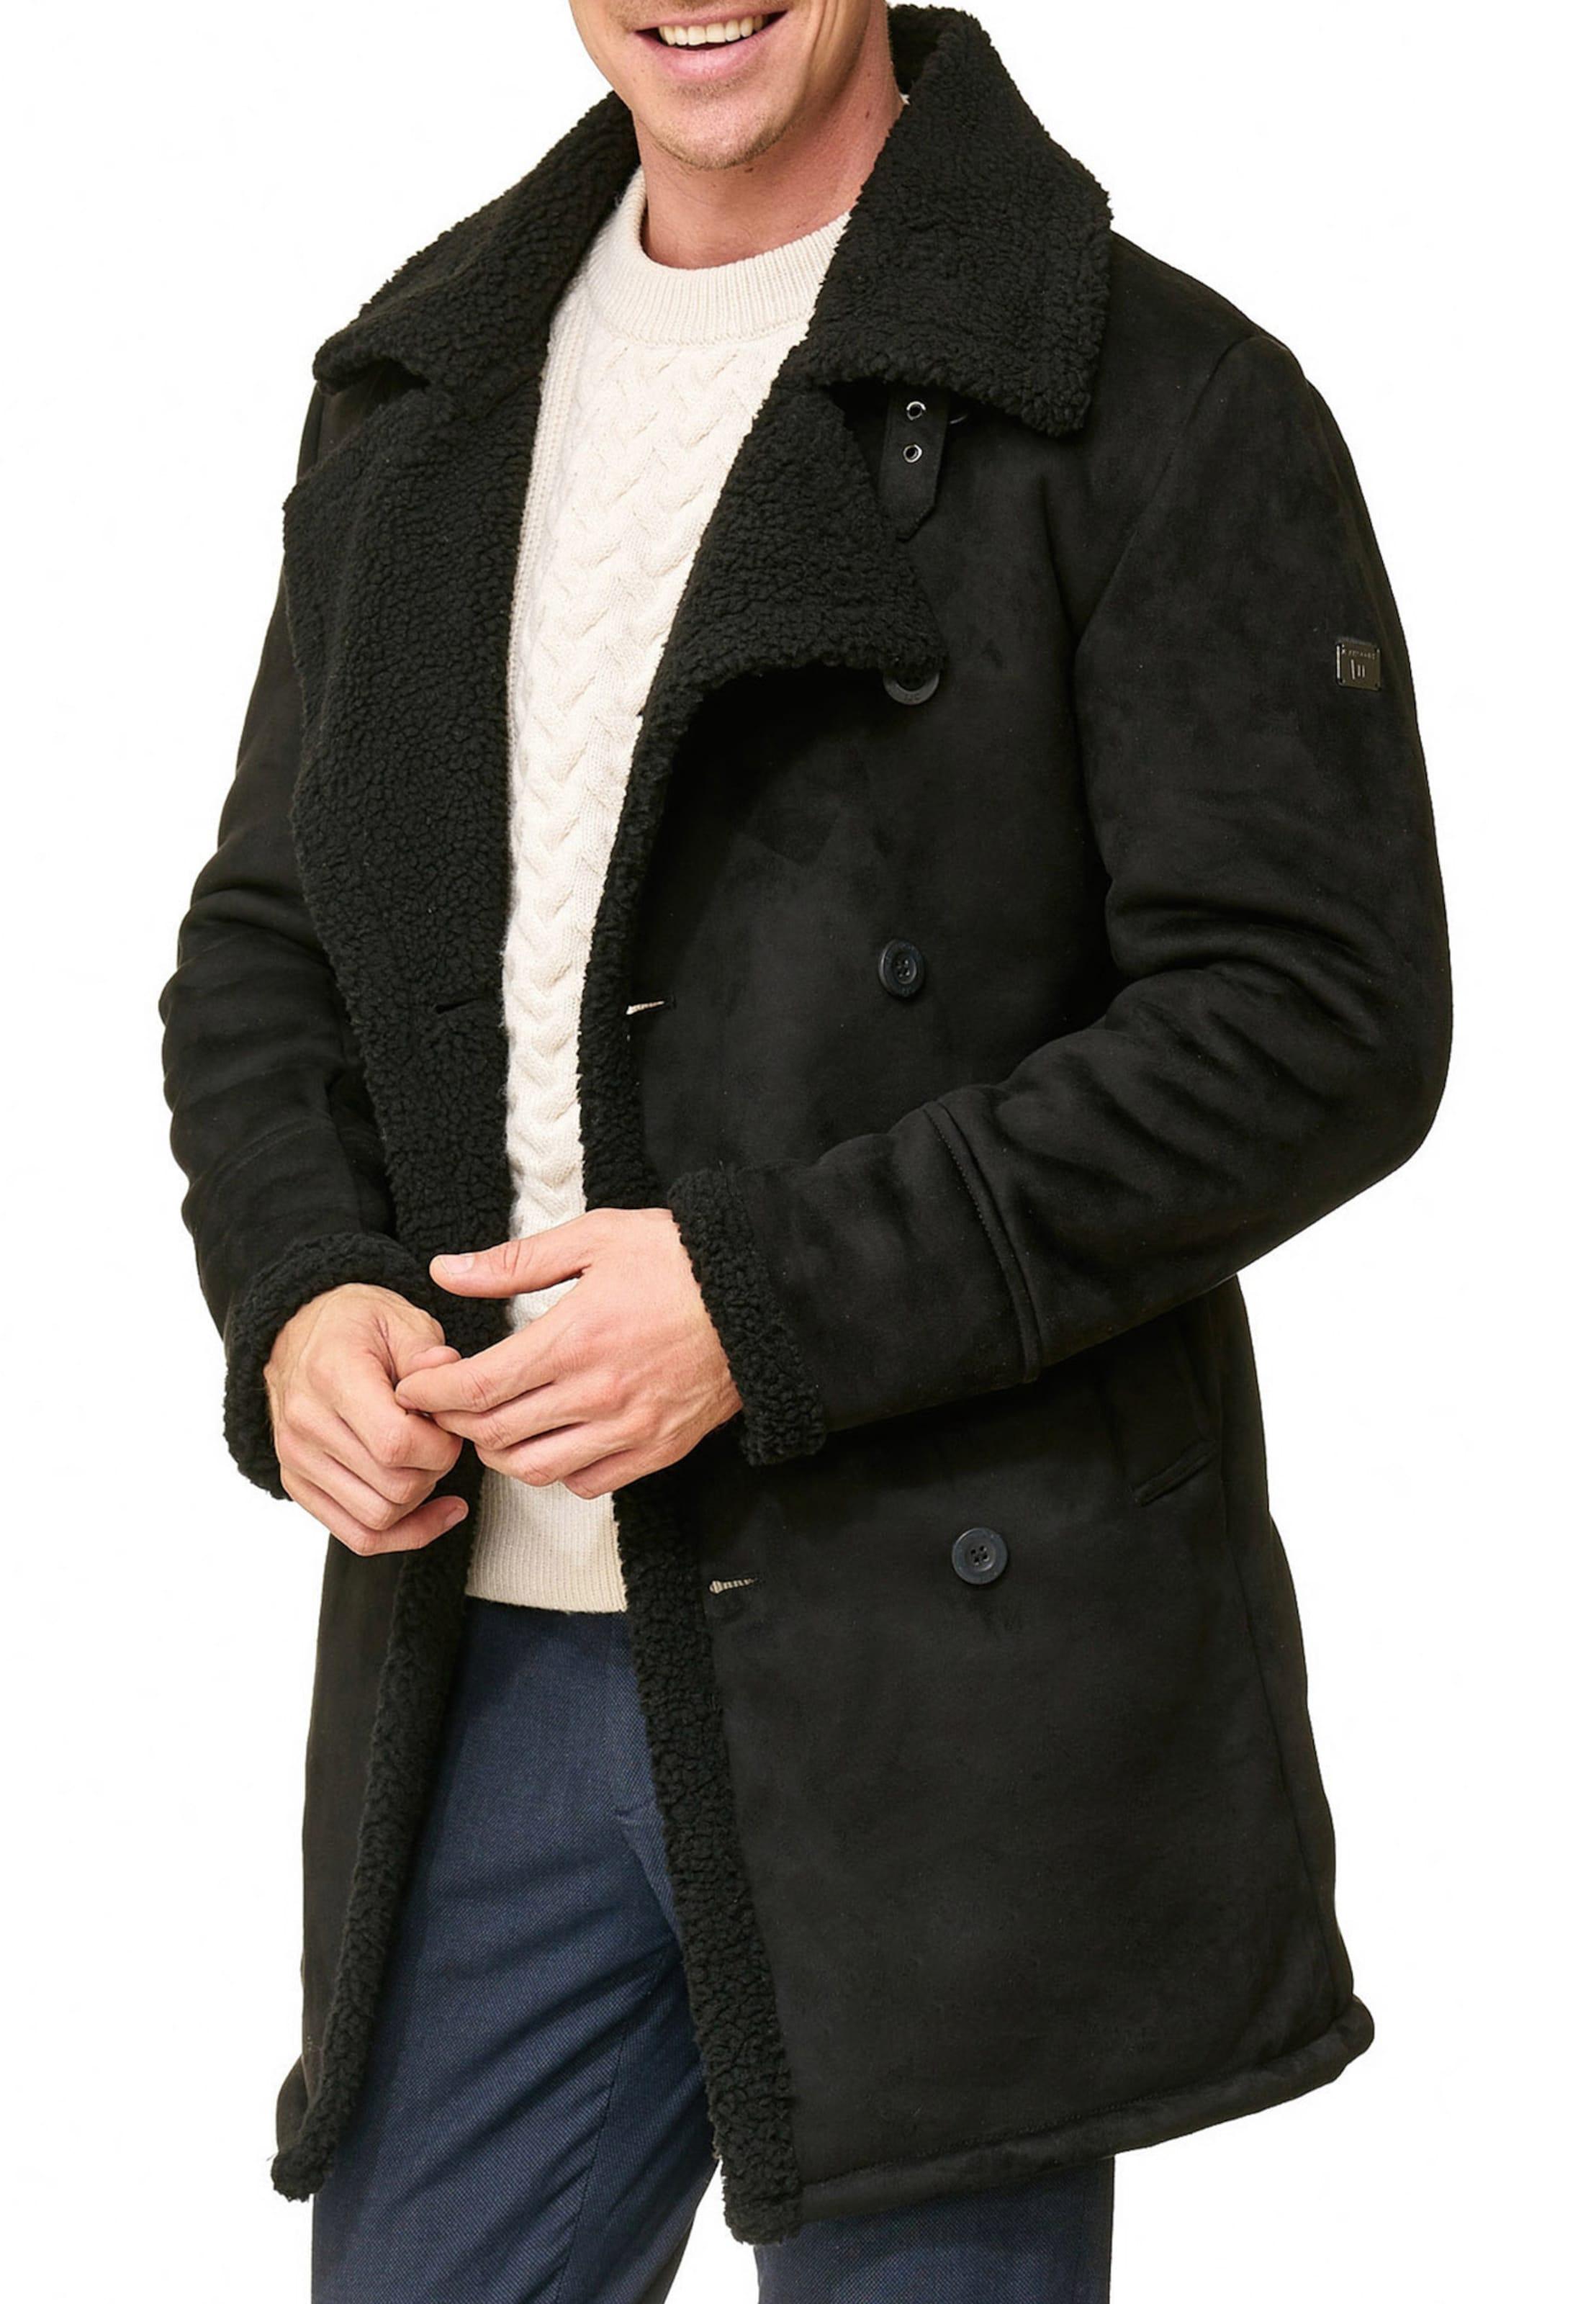 Indicode Mi saison Manteau 'barlow' En Noir Jeans WYe2bHE9ID